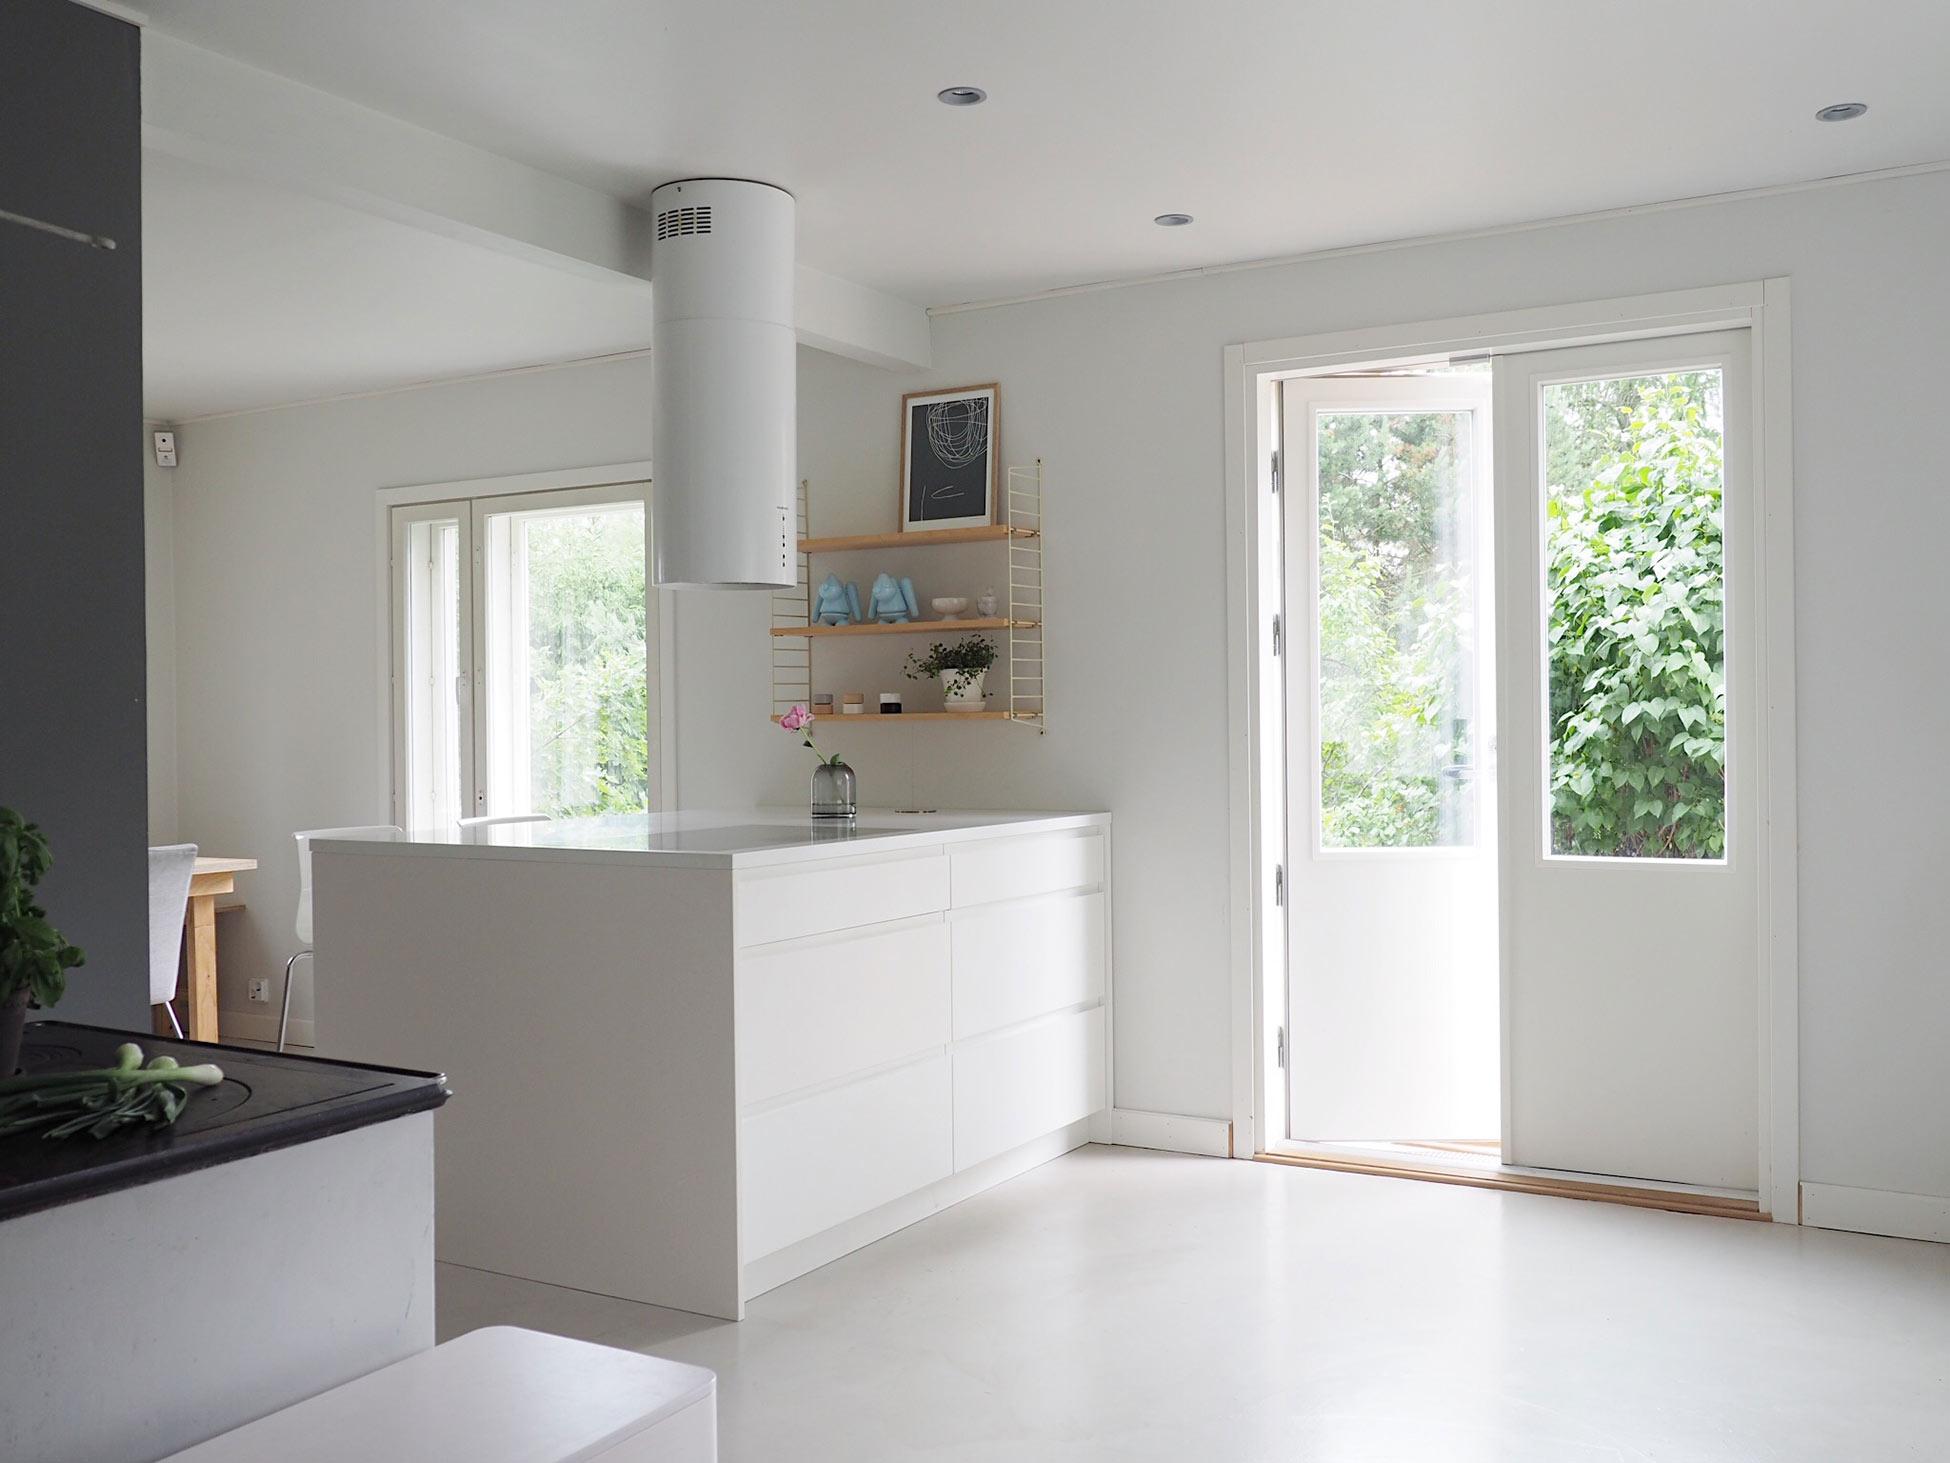 Pilke-Interior keittiösuunnittelu